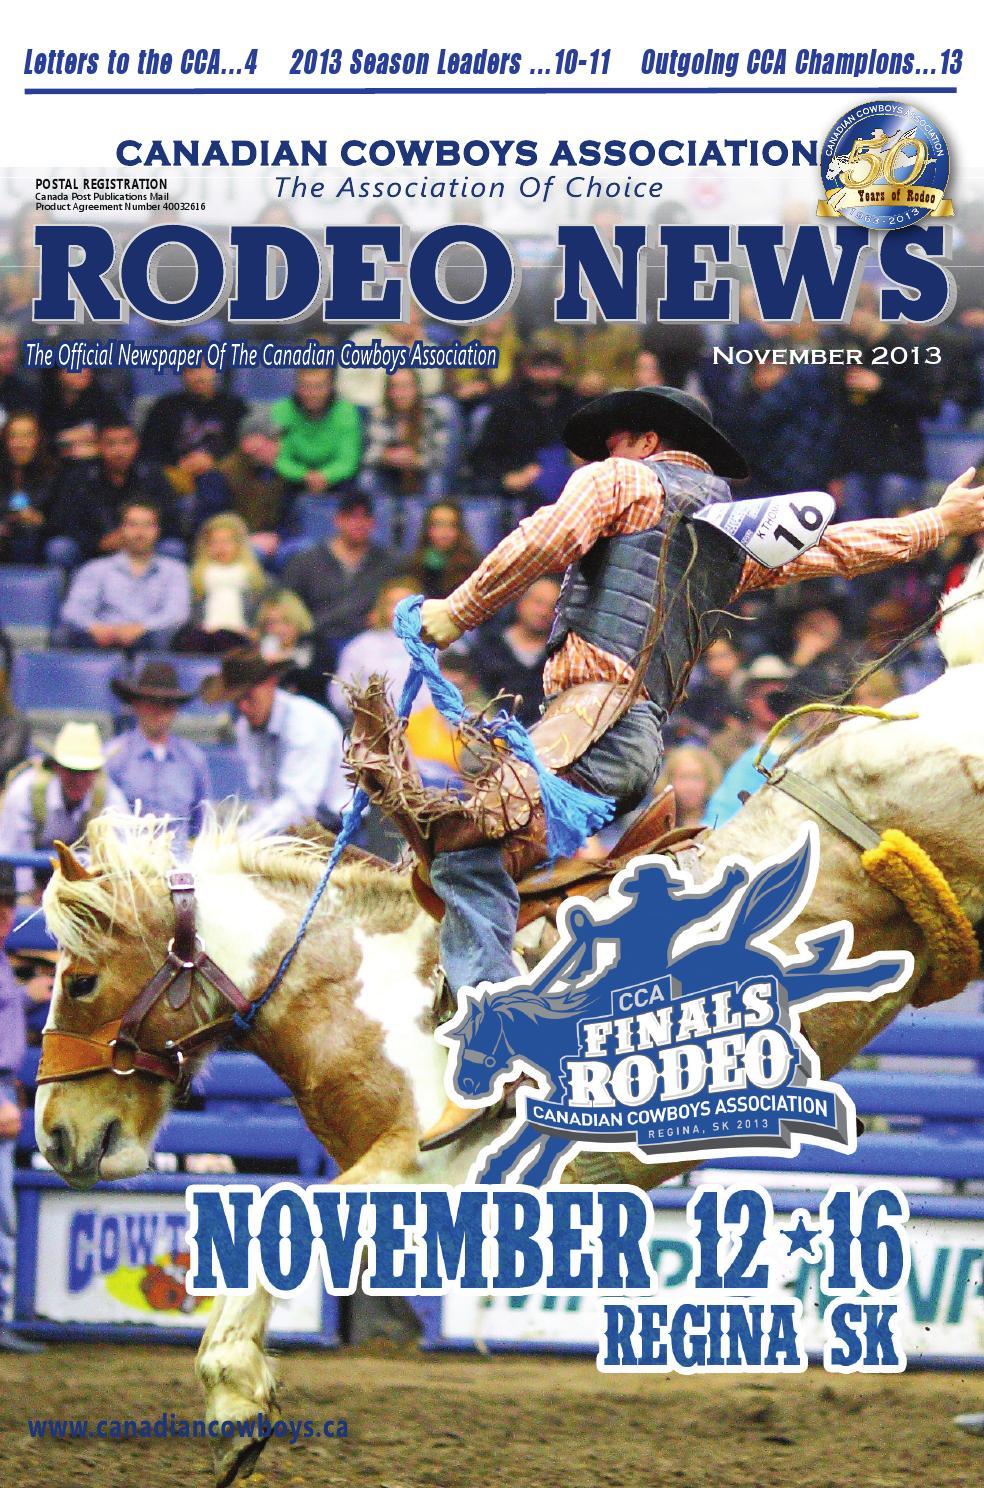 Cca Rodeo News Nov 2013 By Threadhosting Inc Issuu